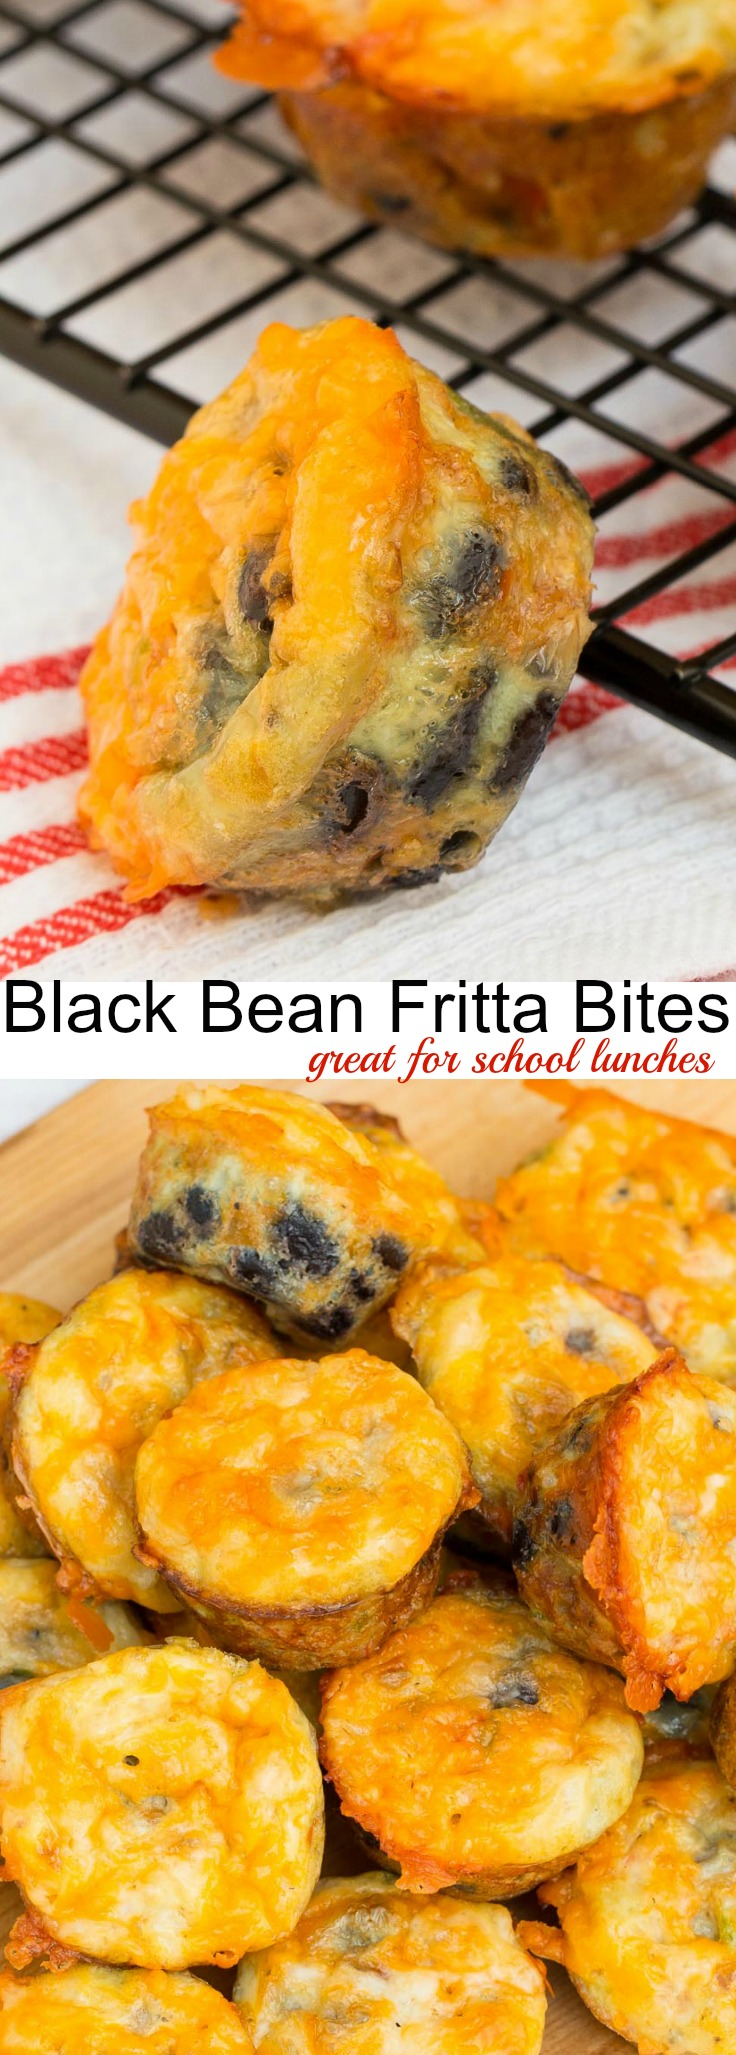 Black Bean Fritta Bites